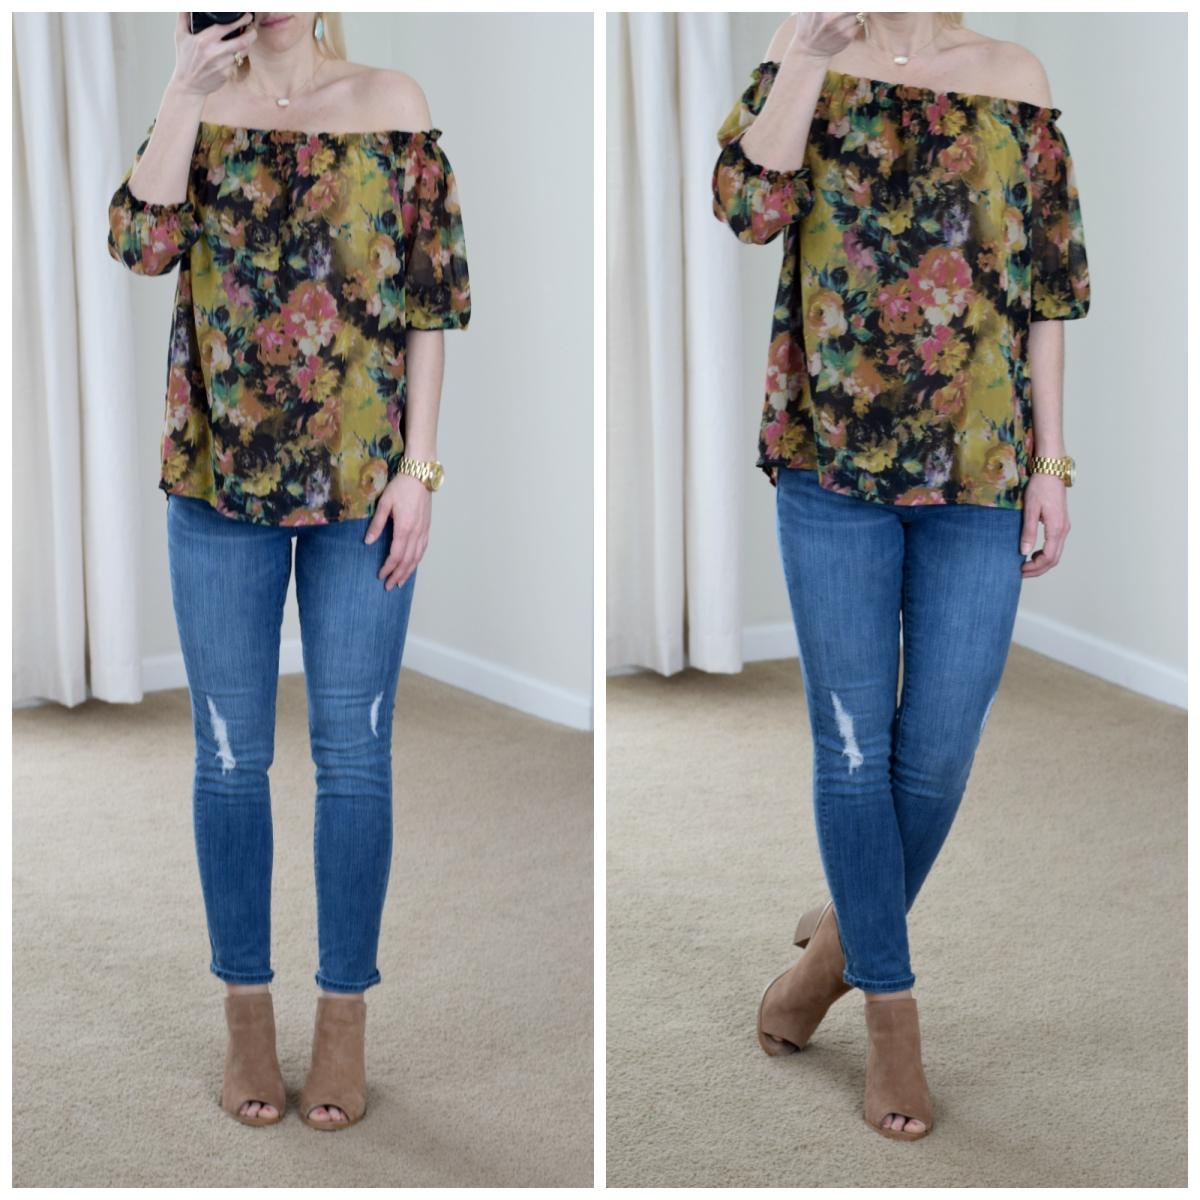 Floral off the shoulder, destroyed skinny jeans, and mules |www.pearlsandsportsbras.com|